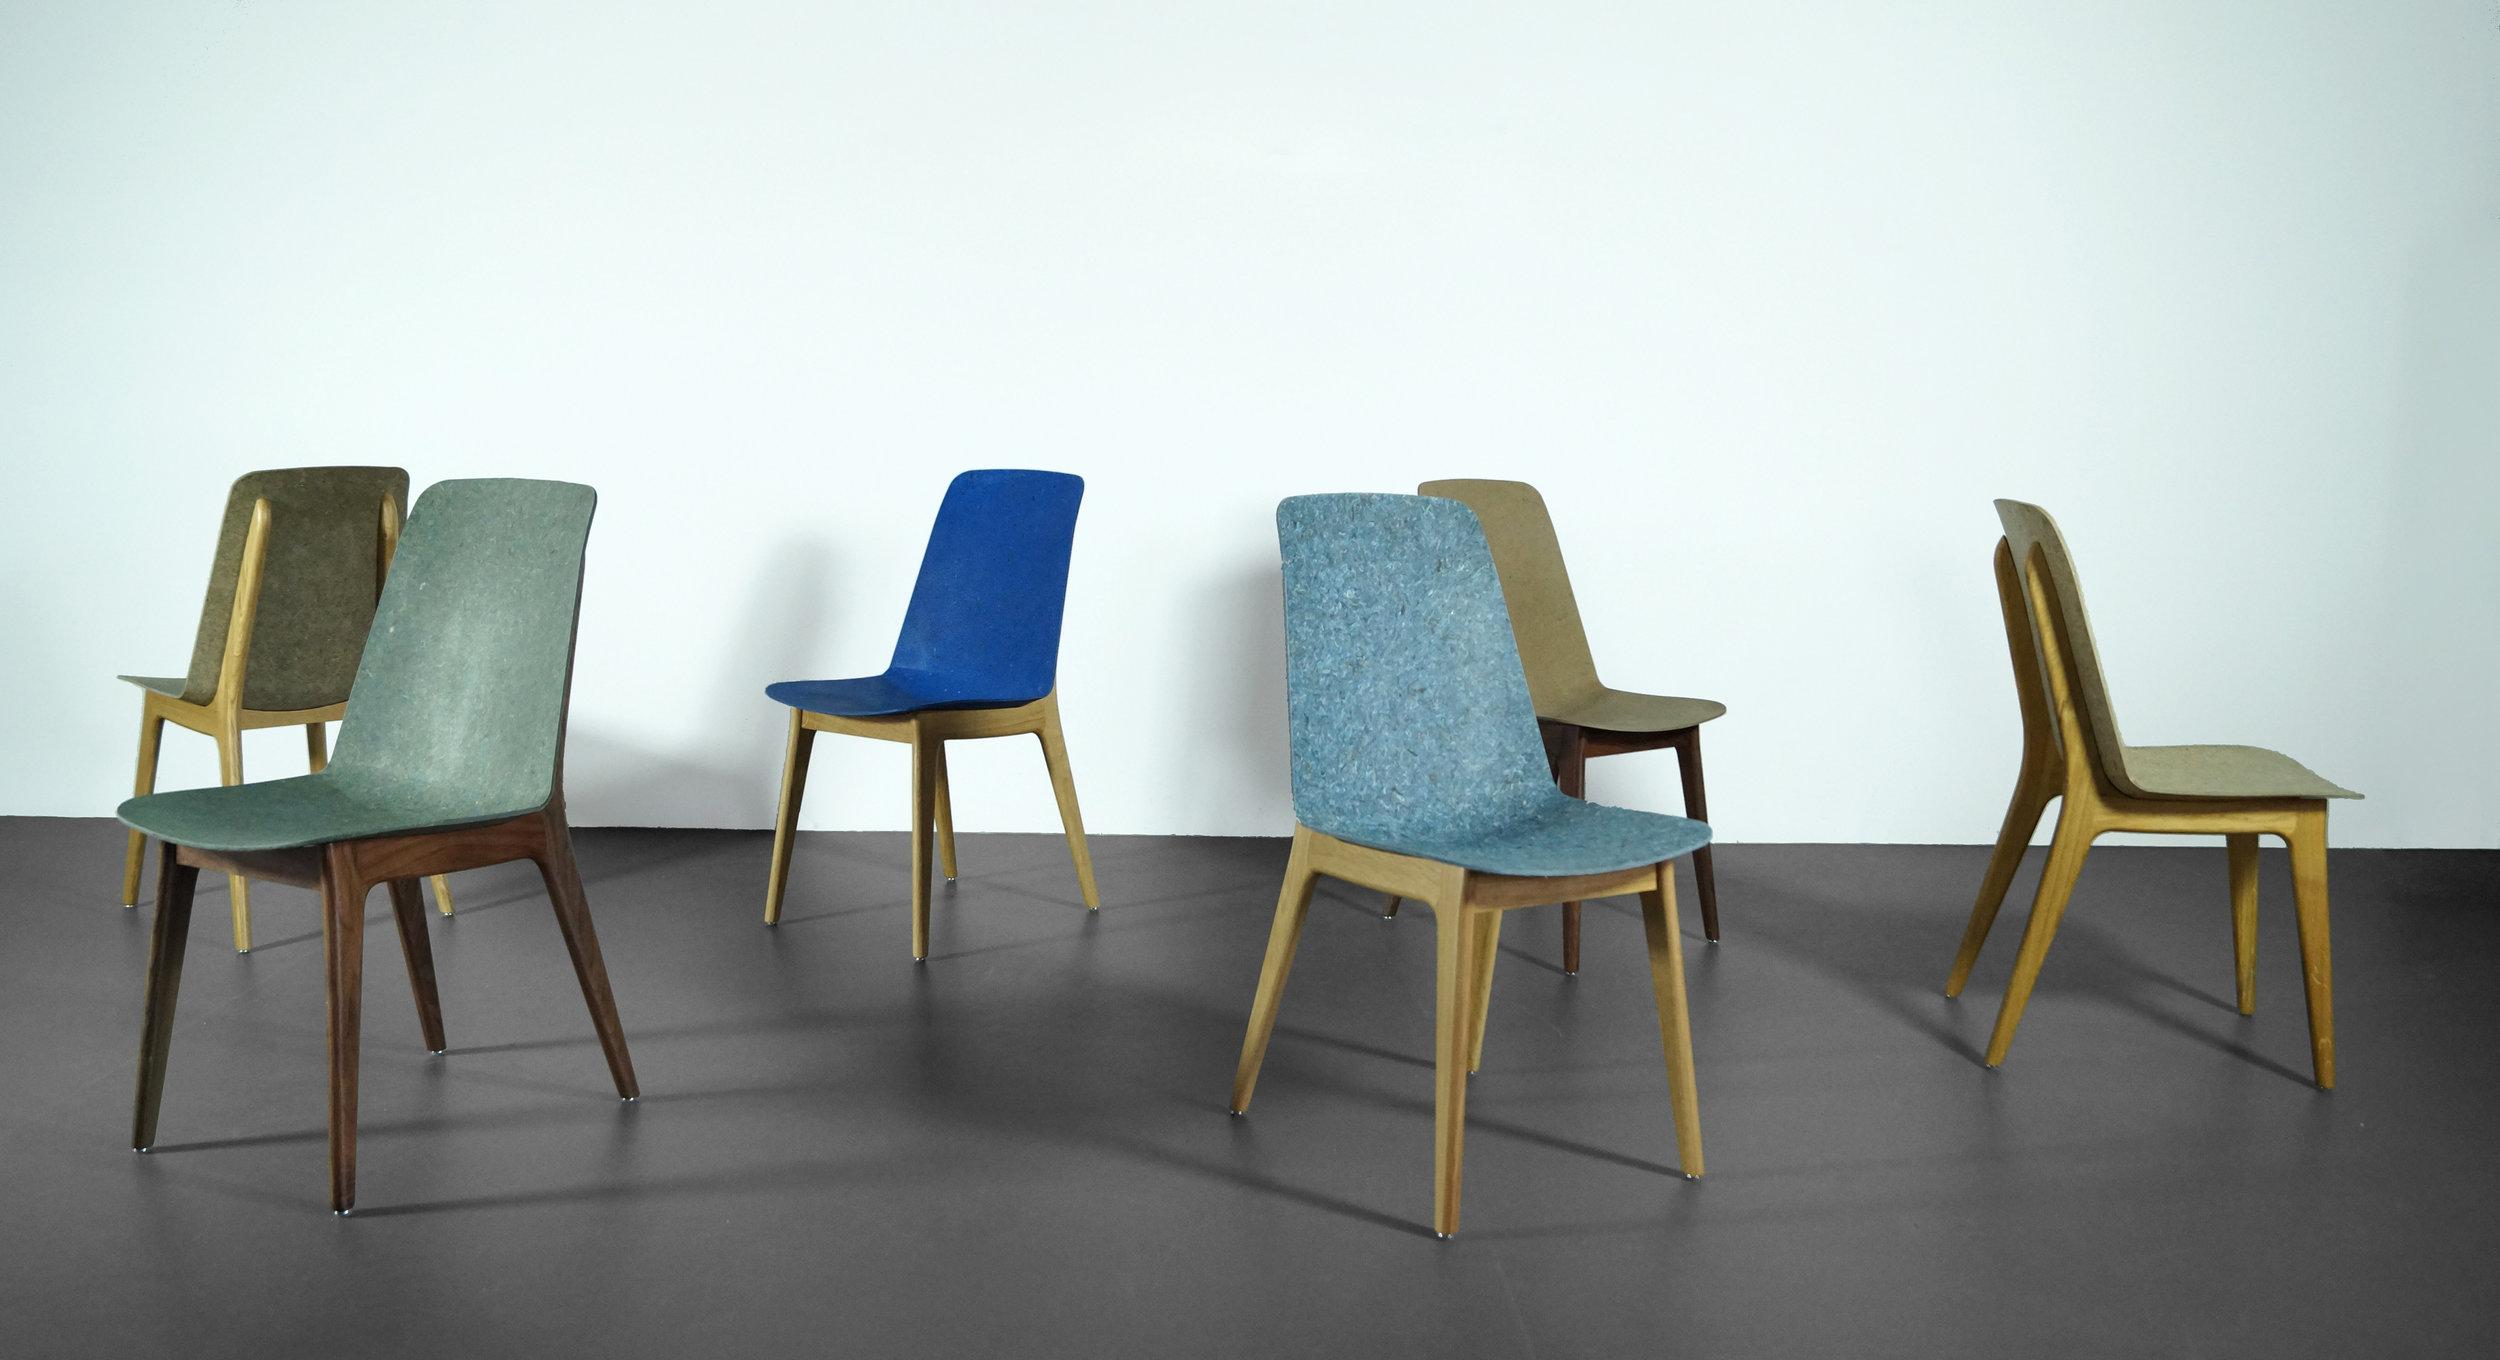 Unusual chairs composition random 2.JPG